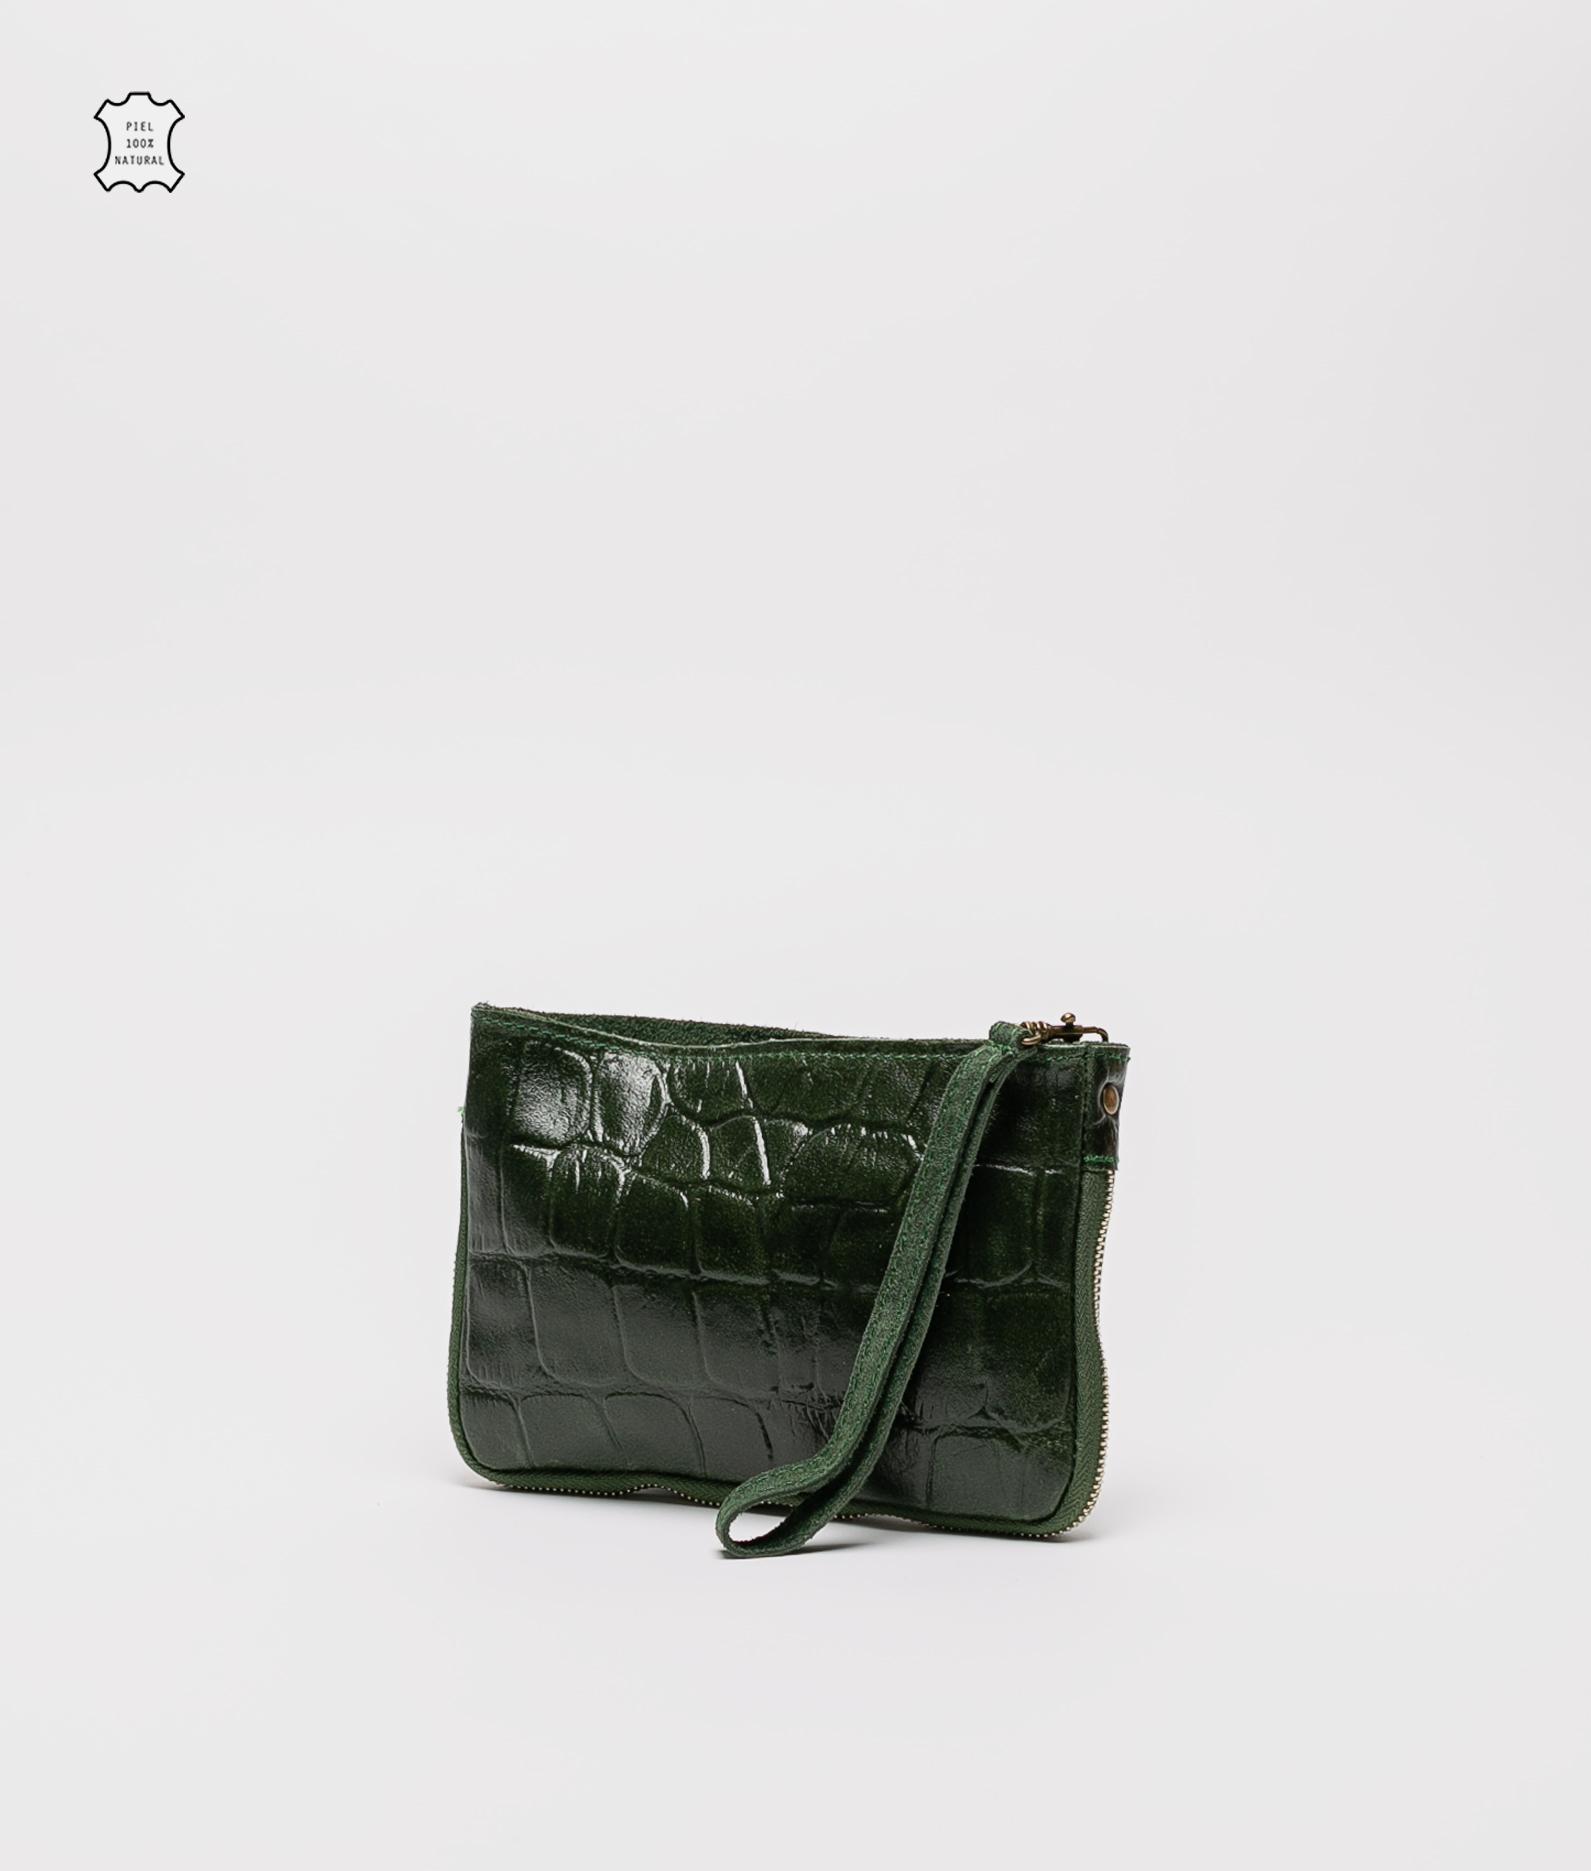 Finland leather crossbody bag - green